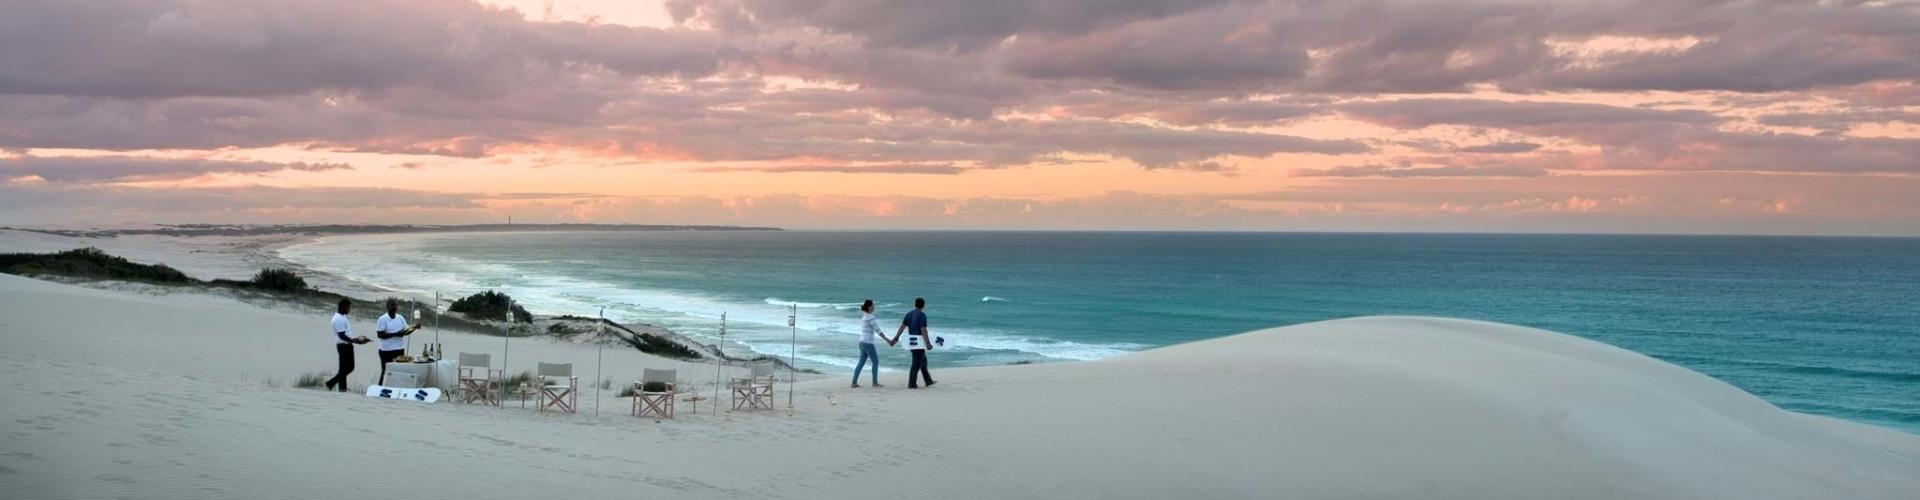 de-hoop-nature-reserve-sundowners-on-the-beach